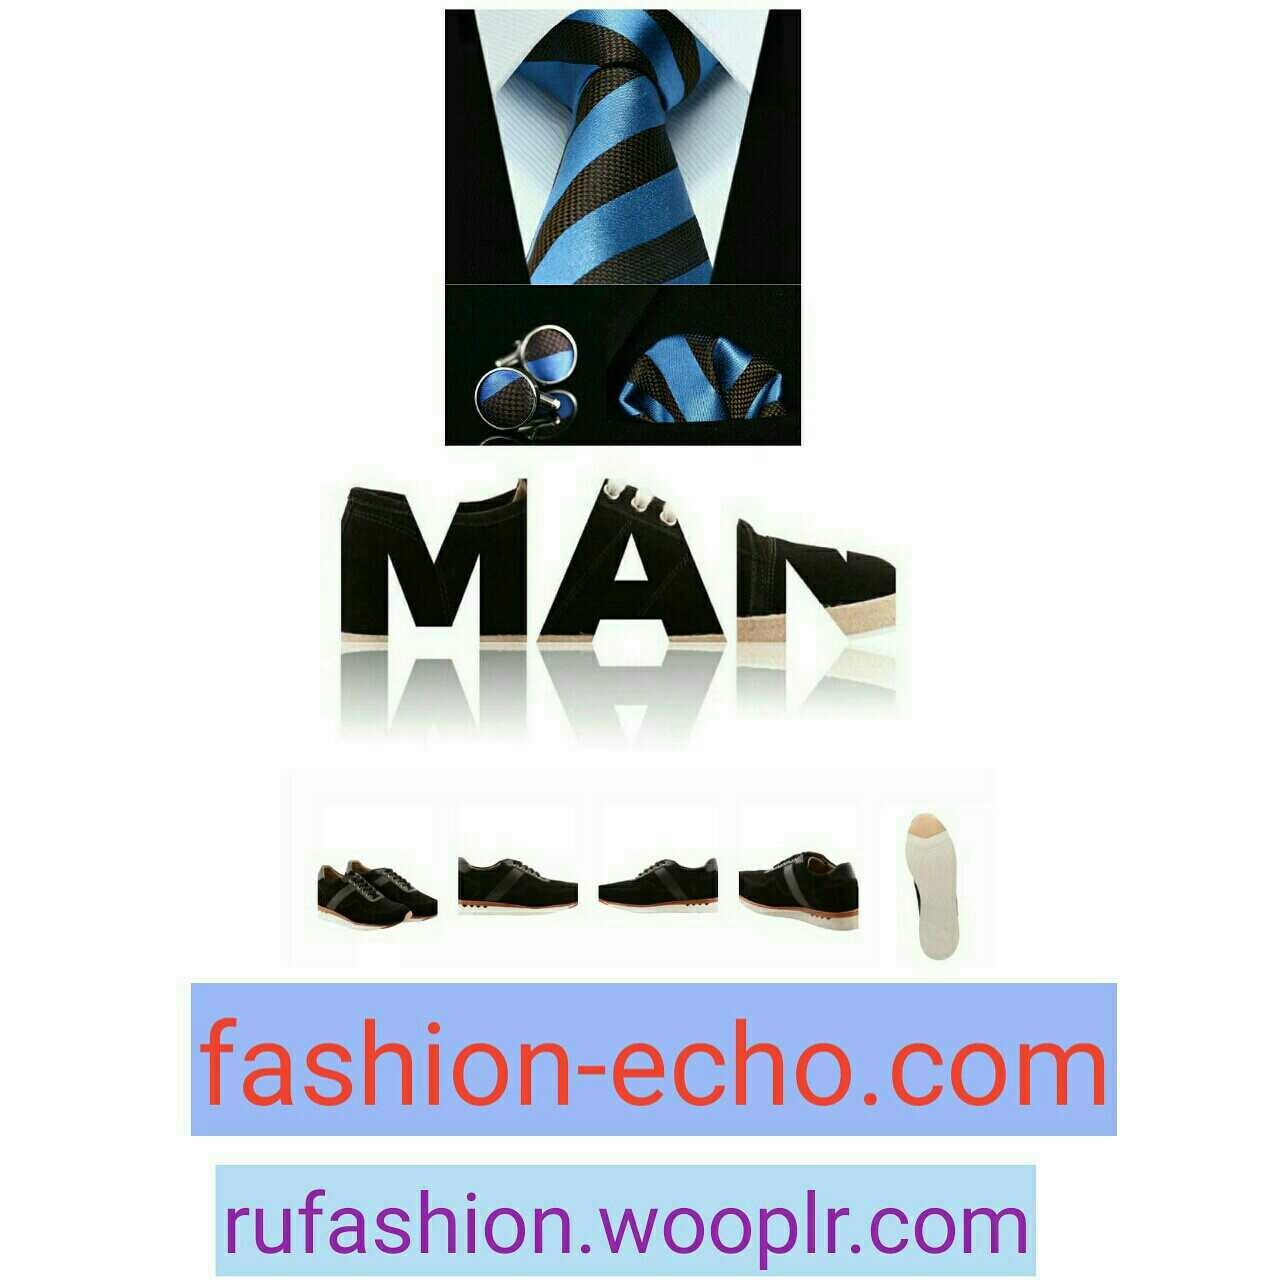 Fashion echo dot com  Bloging(Learner,wooplr#fashion influencer).        website :fashion-echo.com